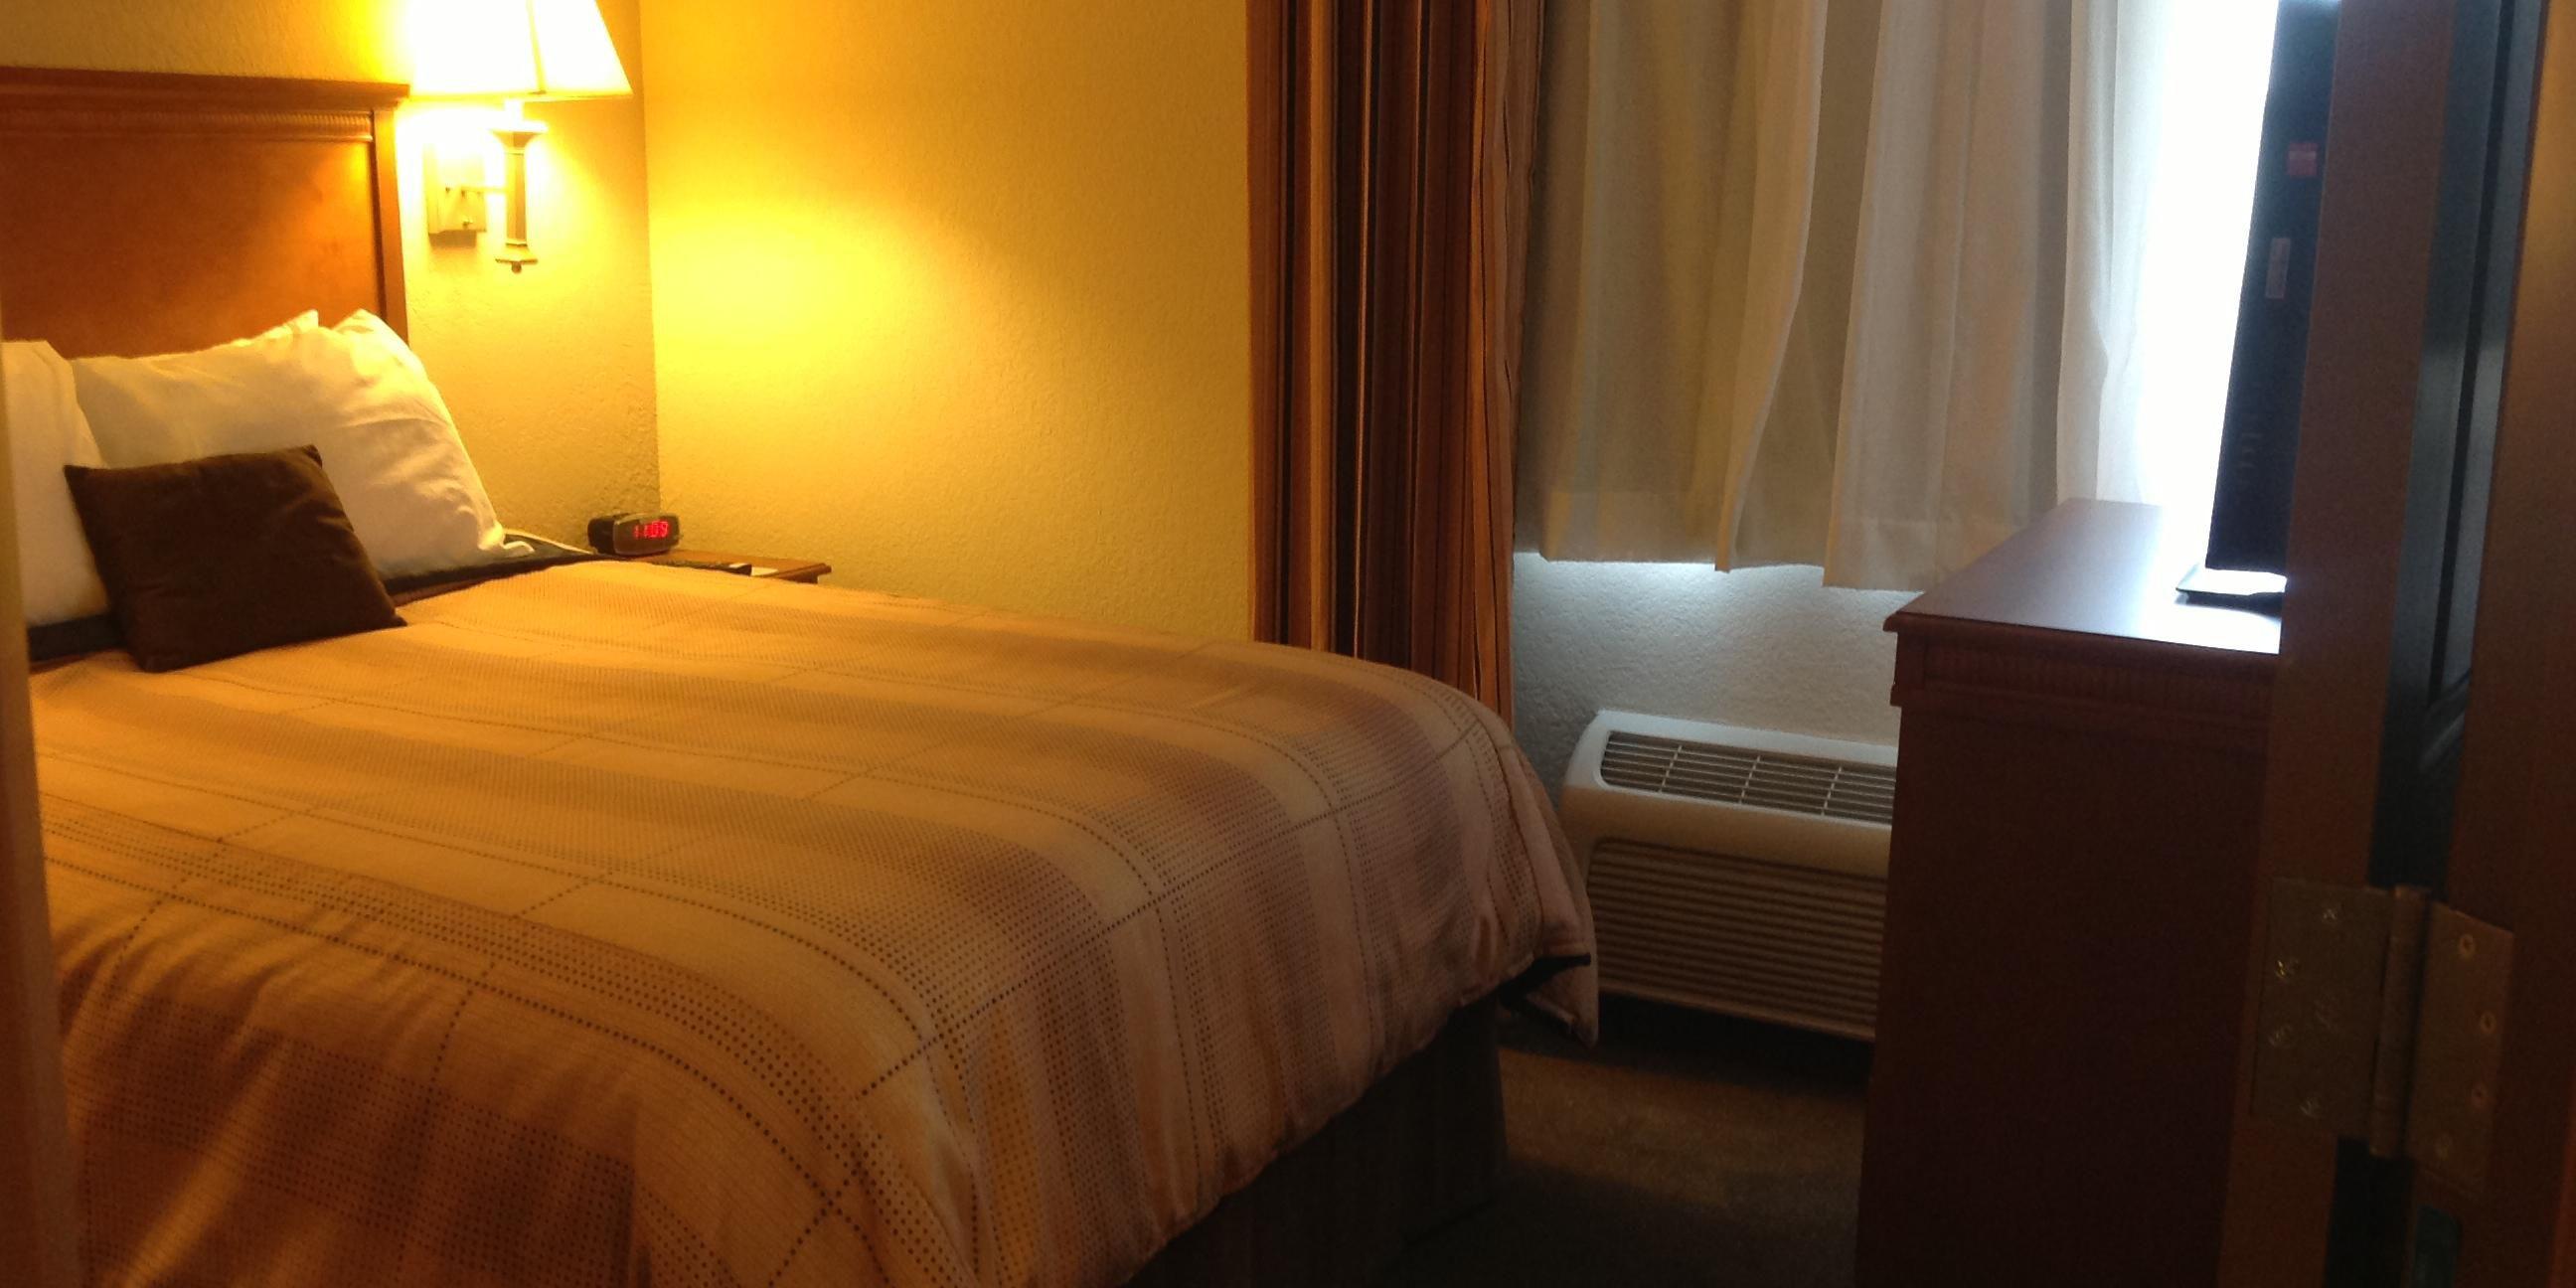 Great Jonesboro Hotels: Candlewood Suites Jonesboro   Extended Stay Hotel In  Jonesboro, Arkansas